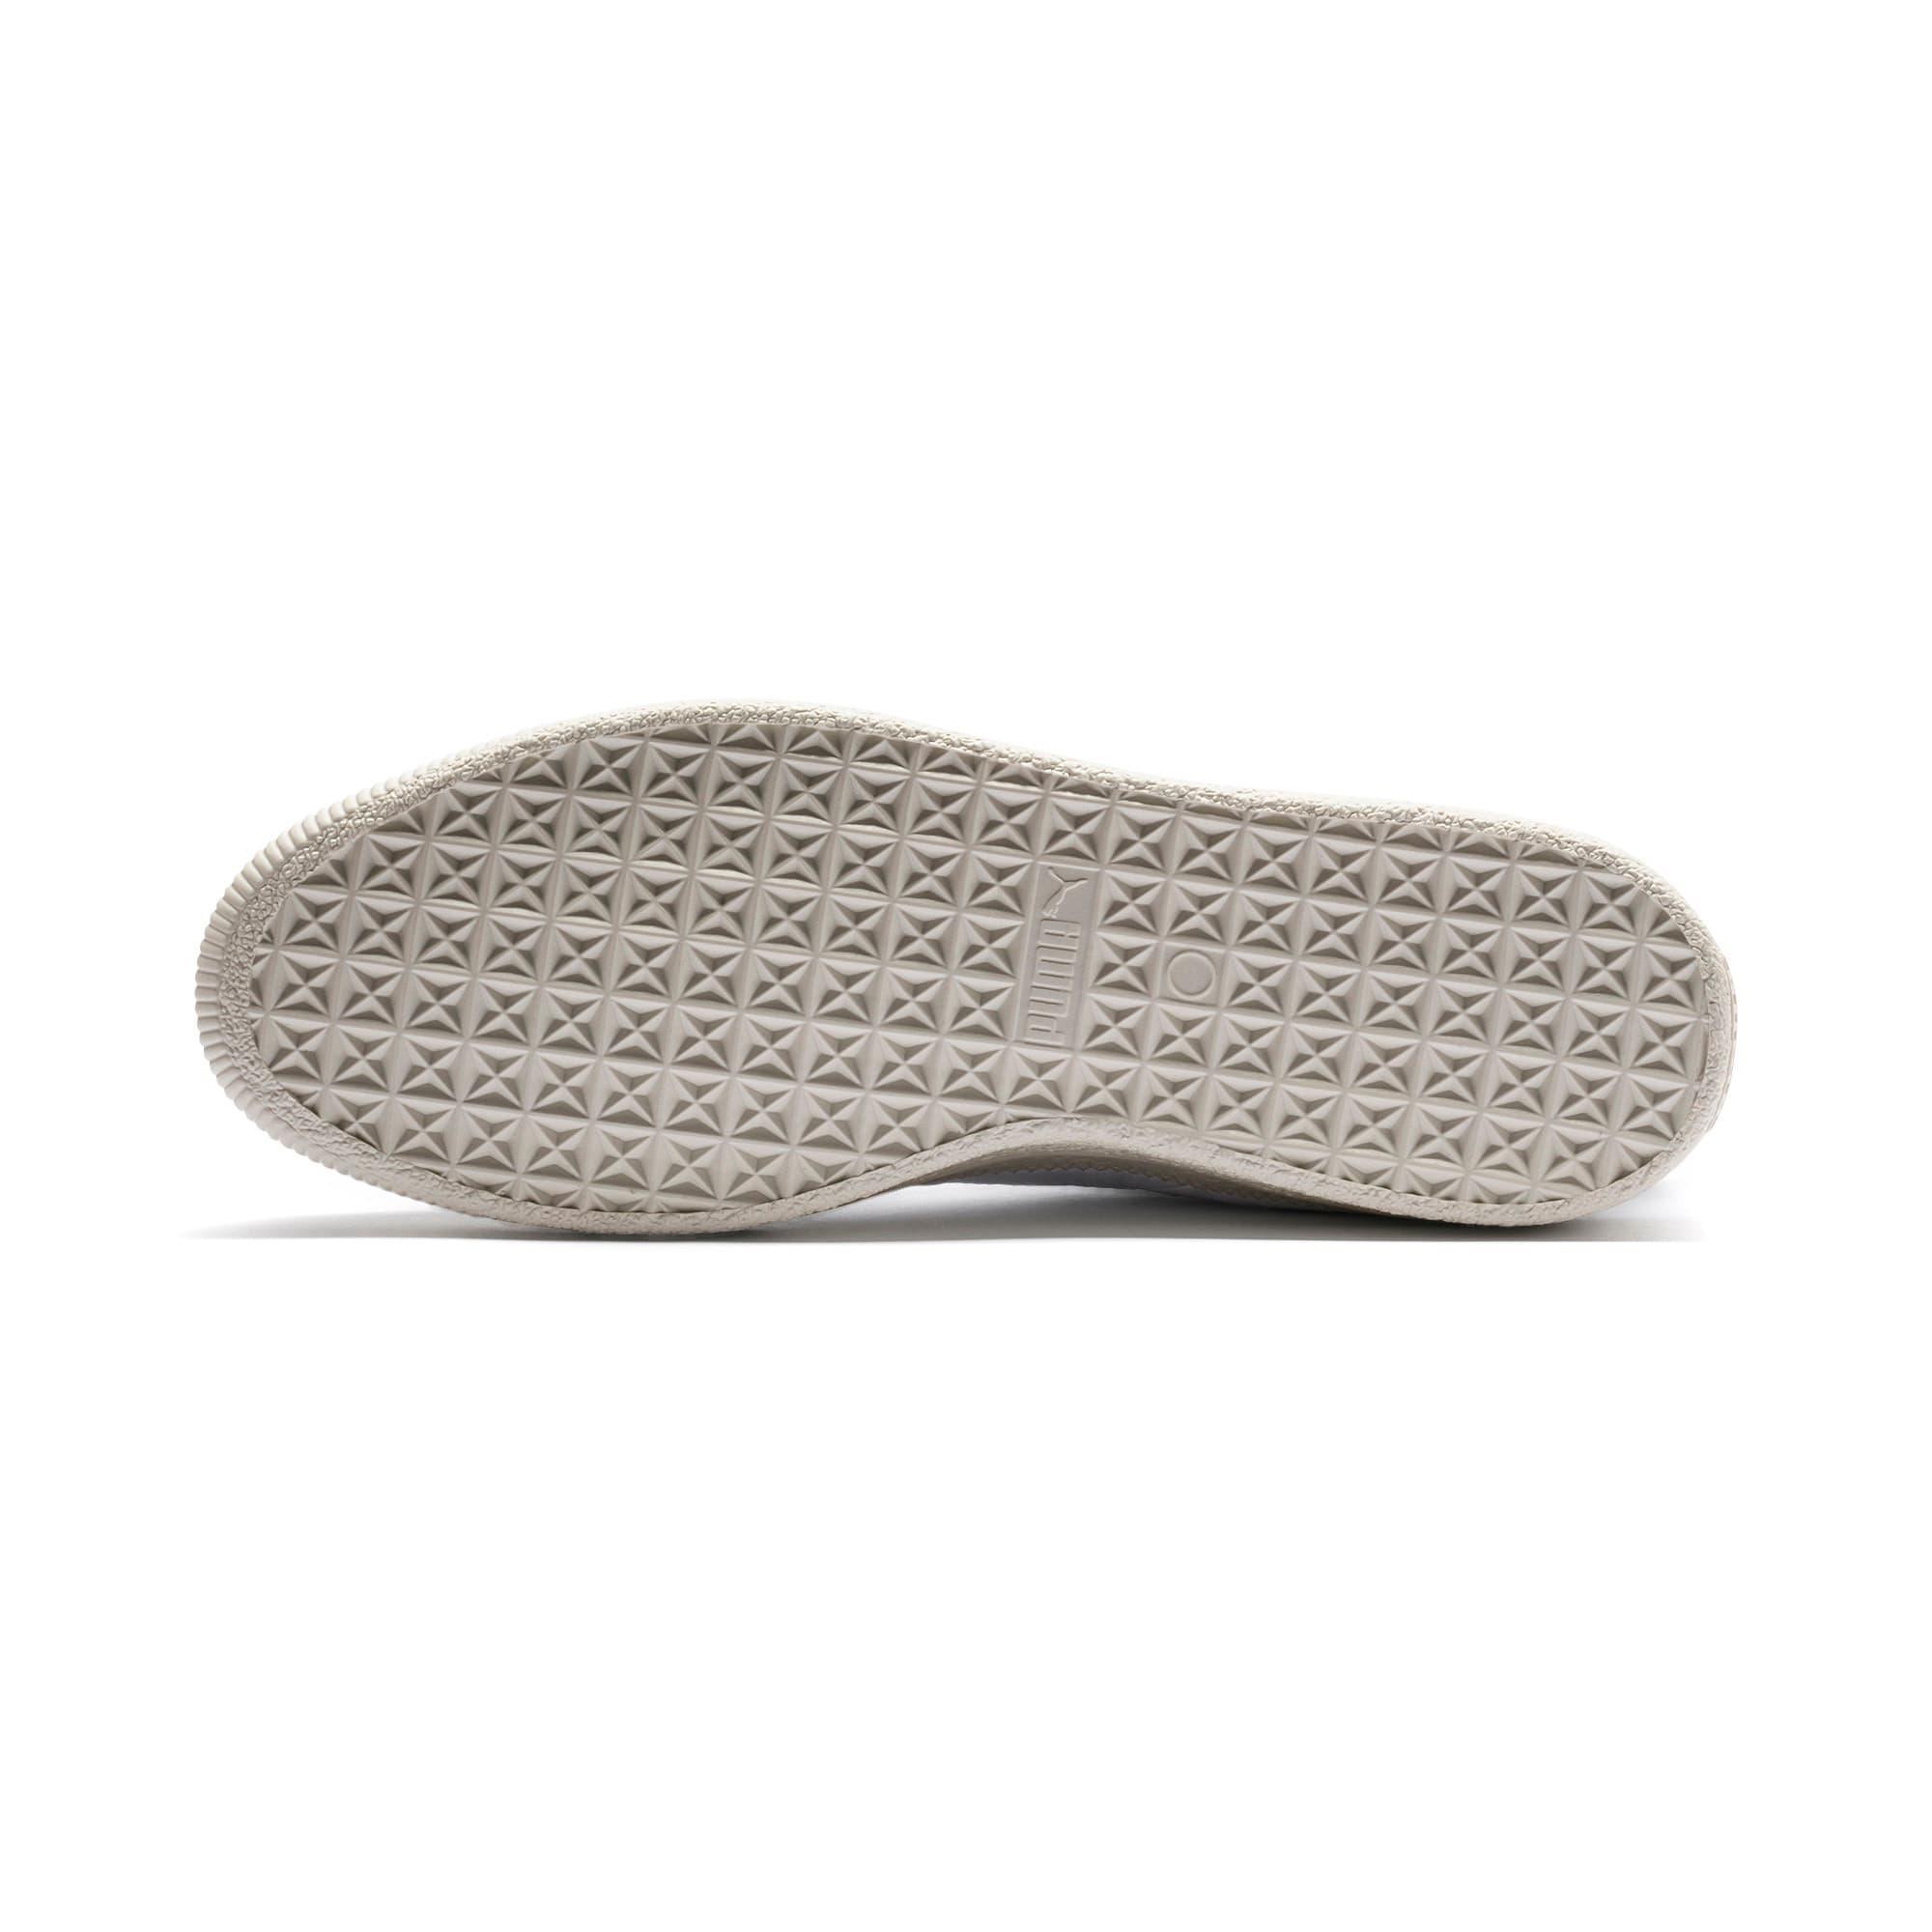 Thumbnail 7 of Basket Trim Shoes, Puma White-Whisper W-Black, medium-IND